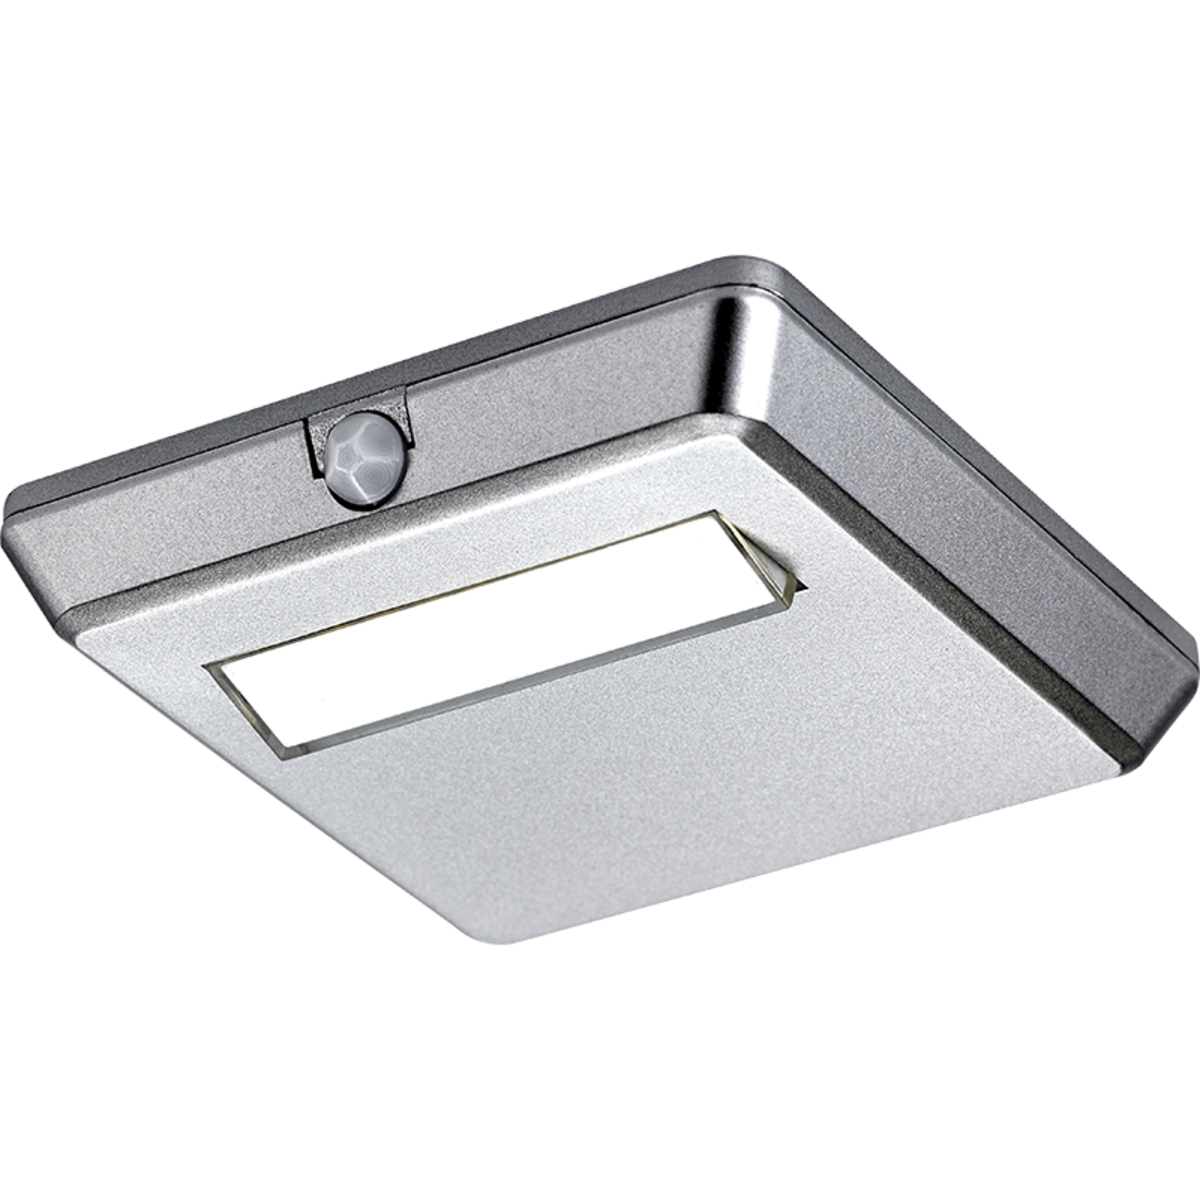 LED sensor tiltable light - Rechargeable